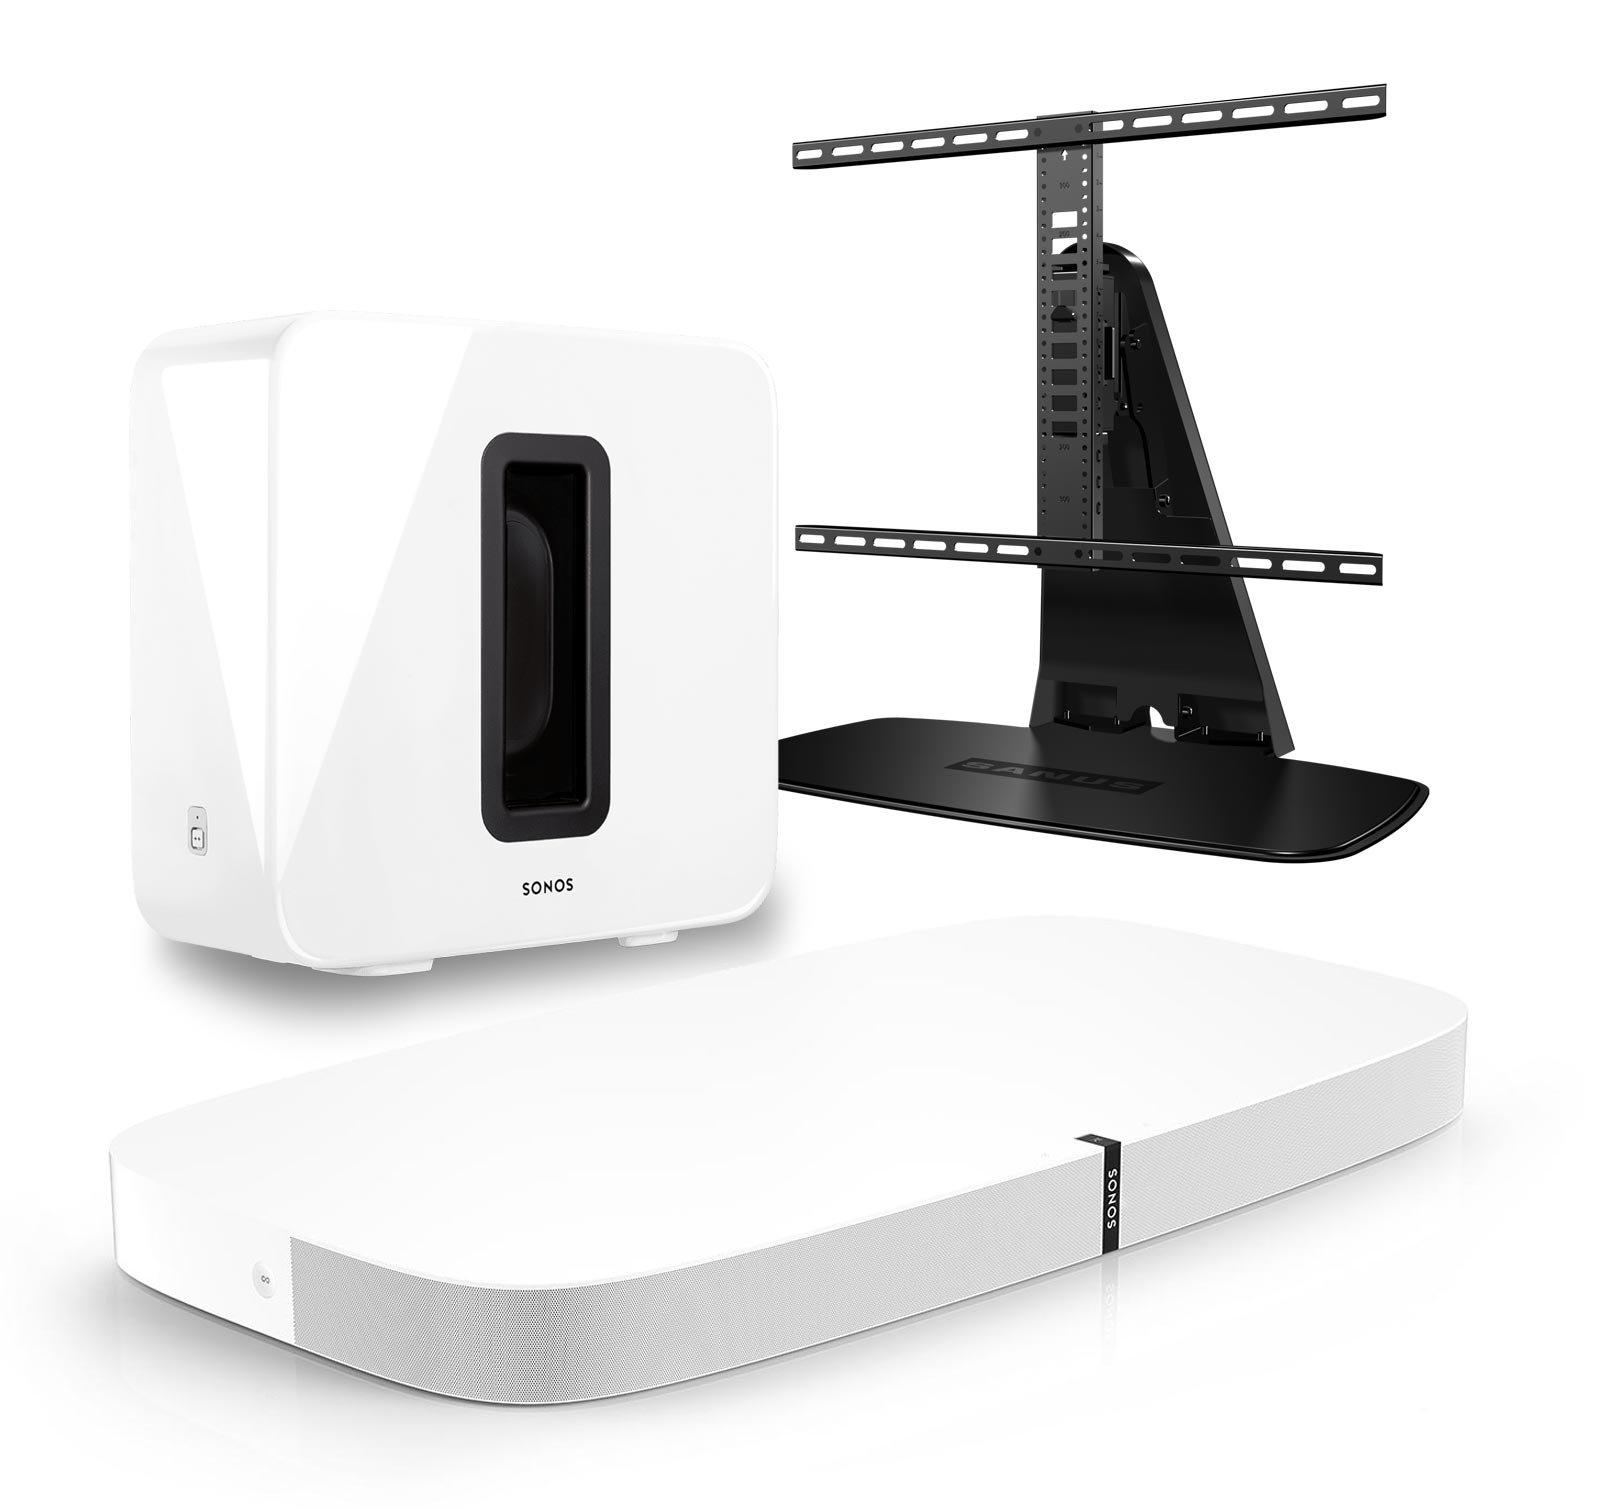 Sonos 3.1 Home Theater Digital Music System Bundle (PLAYBASE, SUB) White & Sanus WSTV1-B1 Swivel TV Base Mount for Sonos PLAYBASE by Sonos